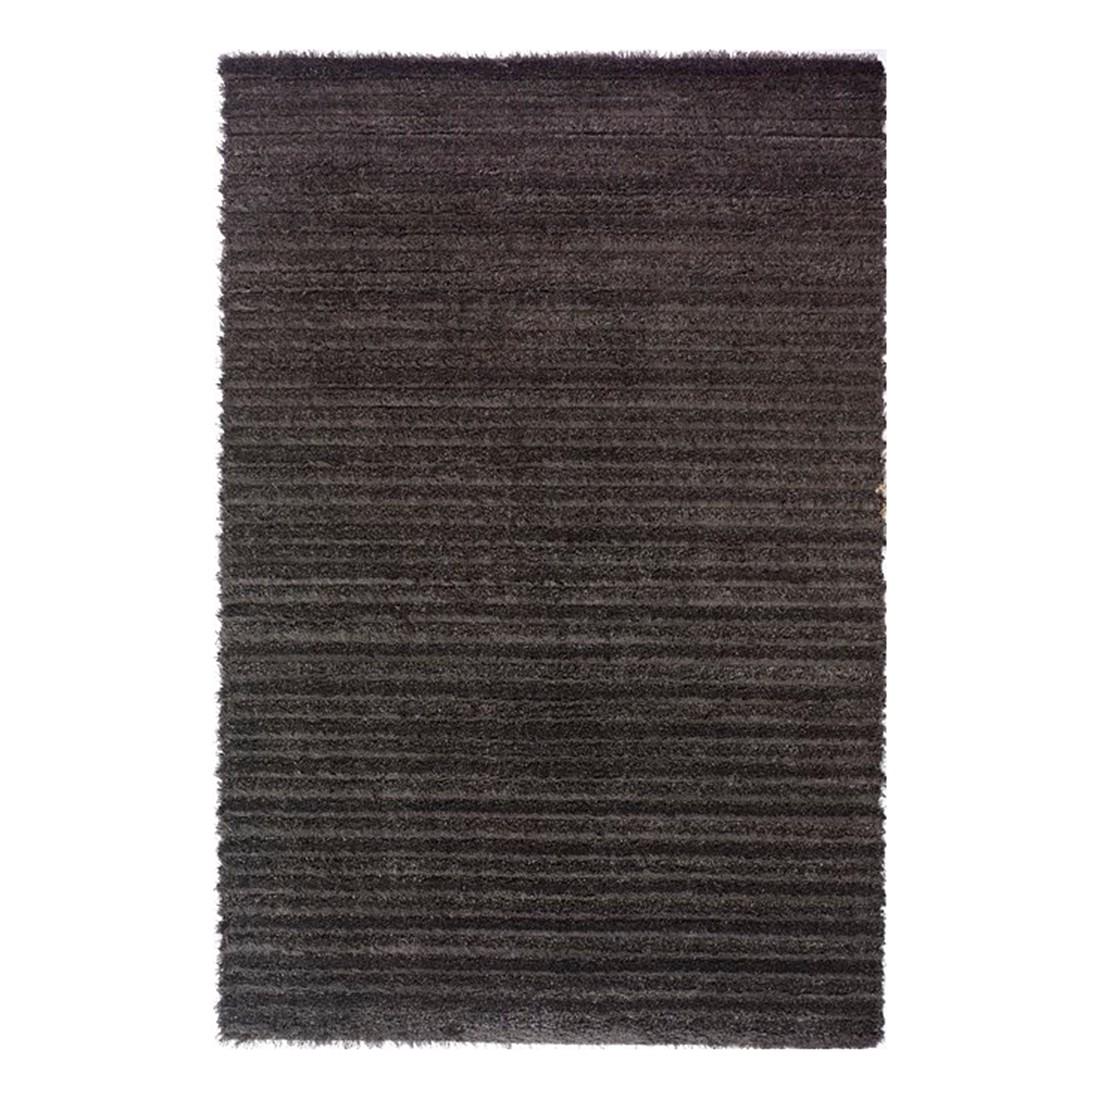 Shaggy Capri – Dunkelbraun – Maße: 160 x 228 cm, Safavieh bestellen